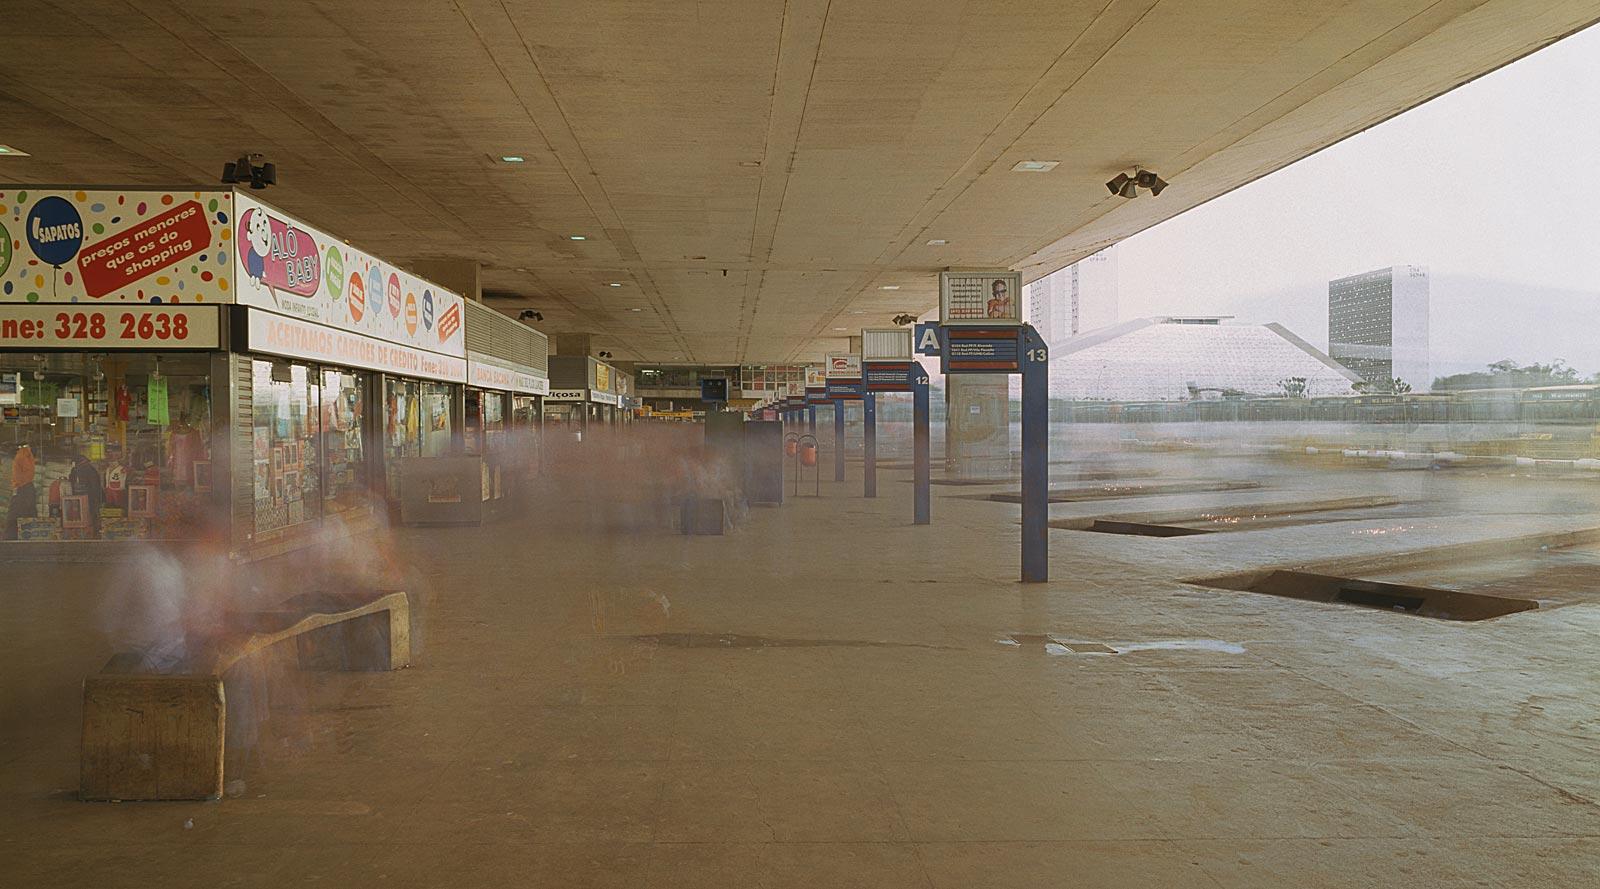 Plataforma Rodoviária, Brasilia